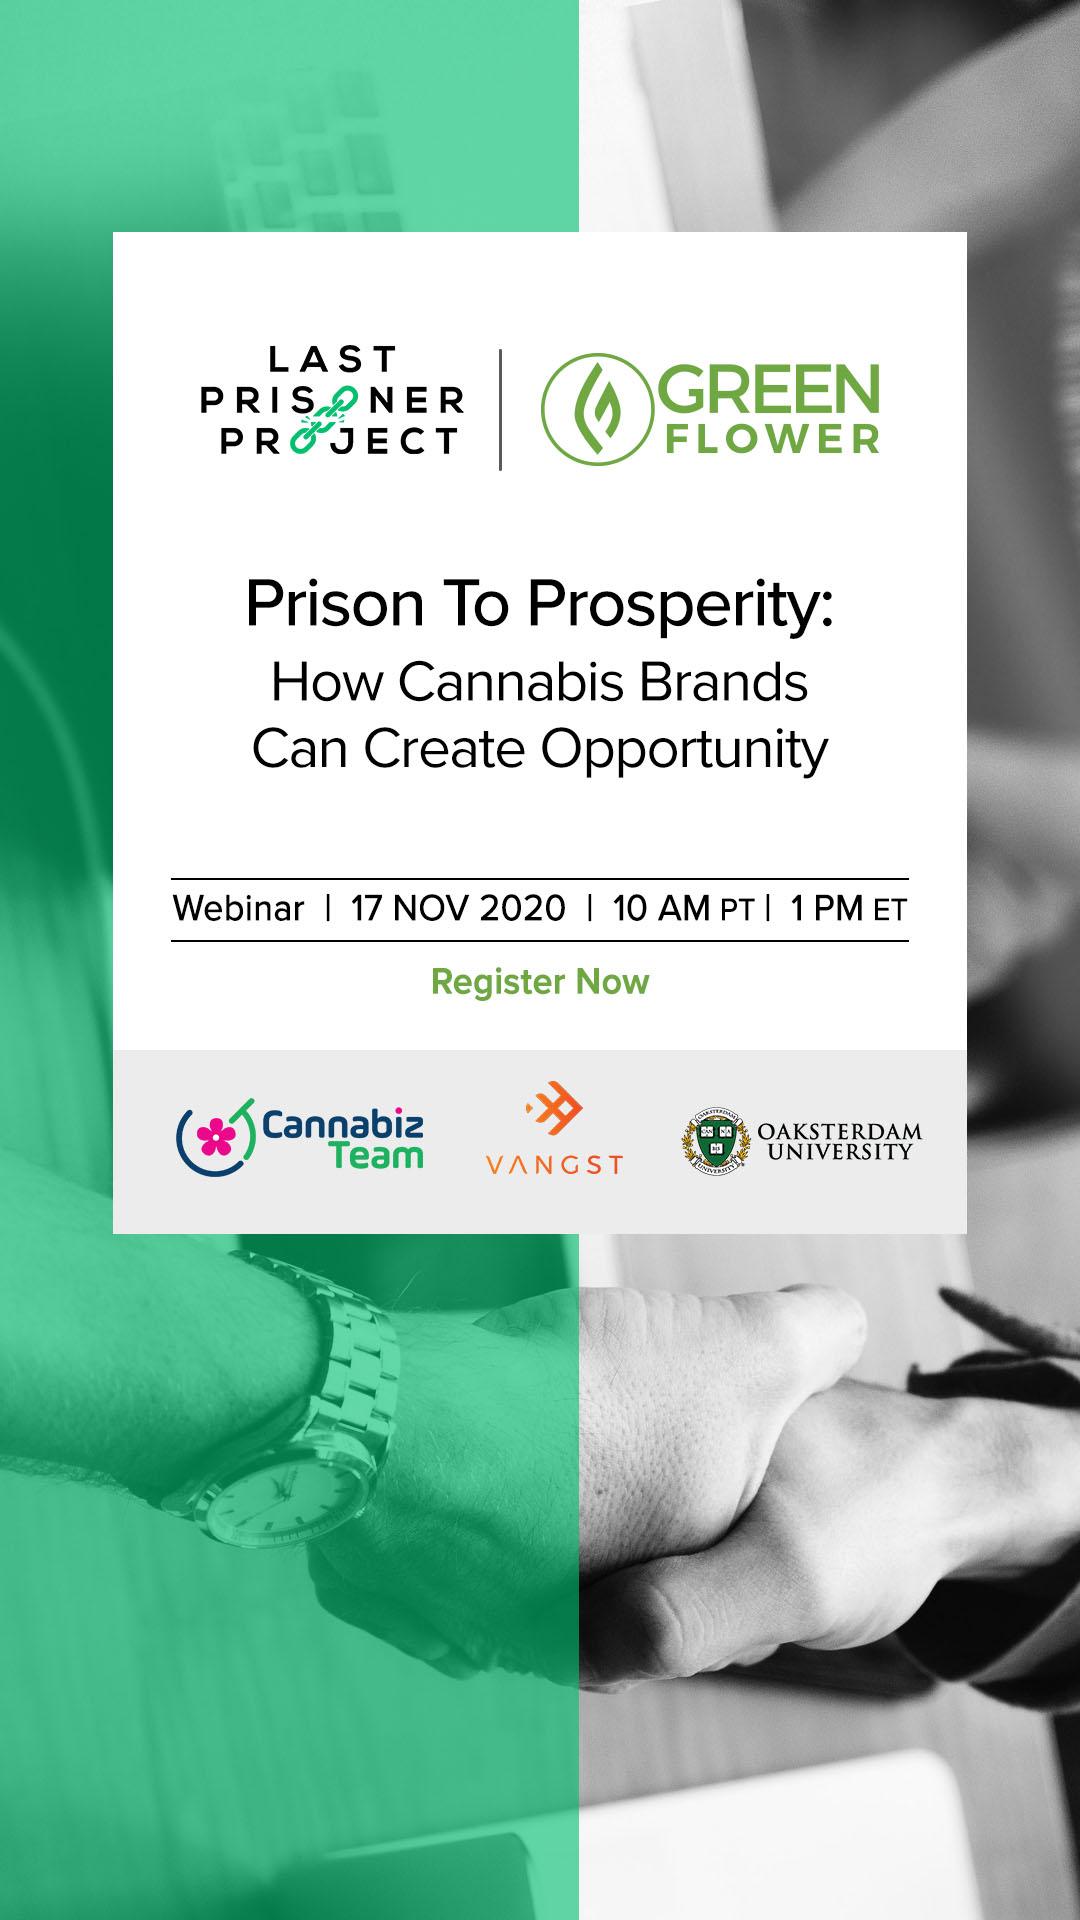 green flower and LPP webinar banner ad